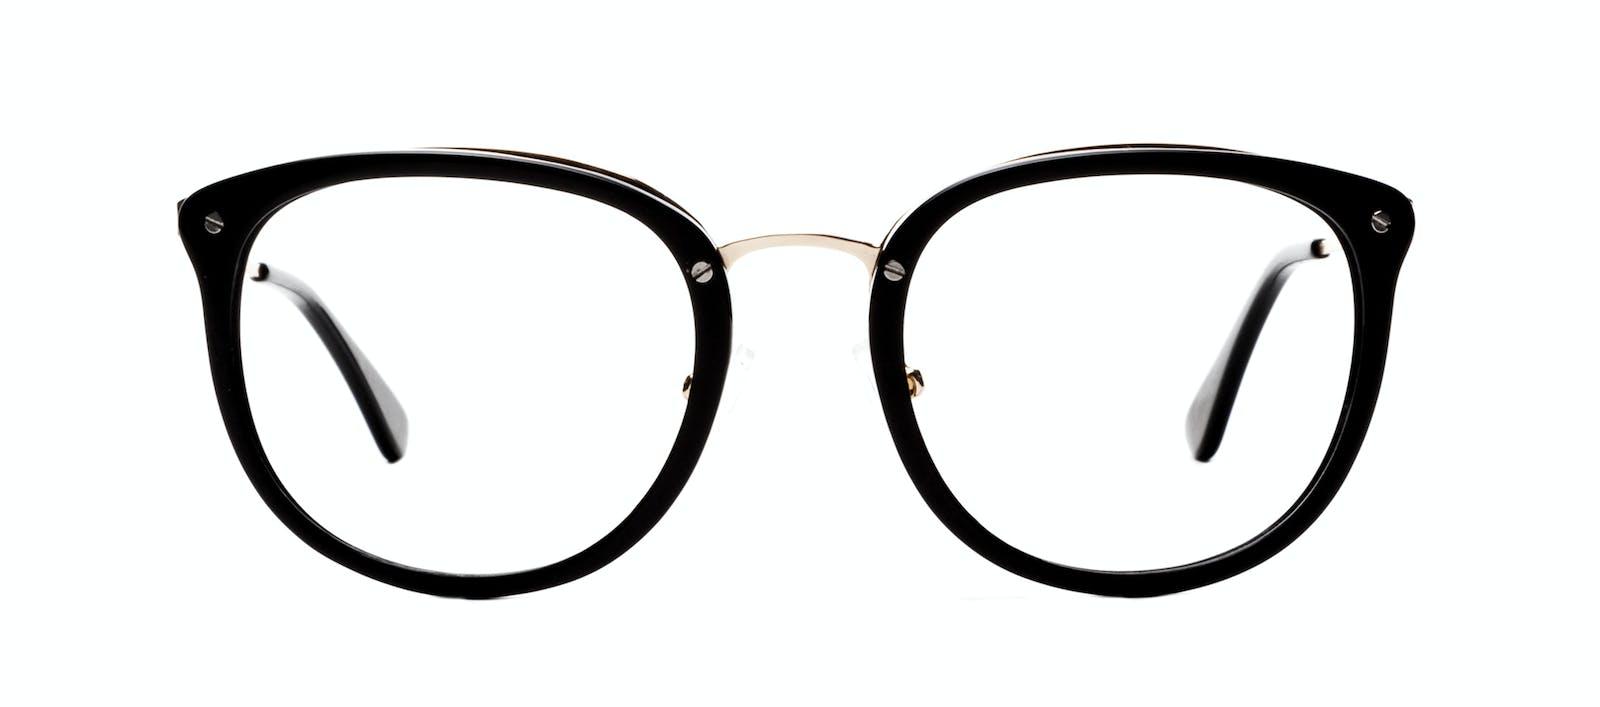 db2cc633ce Affordable Fashion Glasses Square Round Eyeglasses Women Amaze Onyx Front